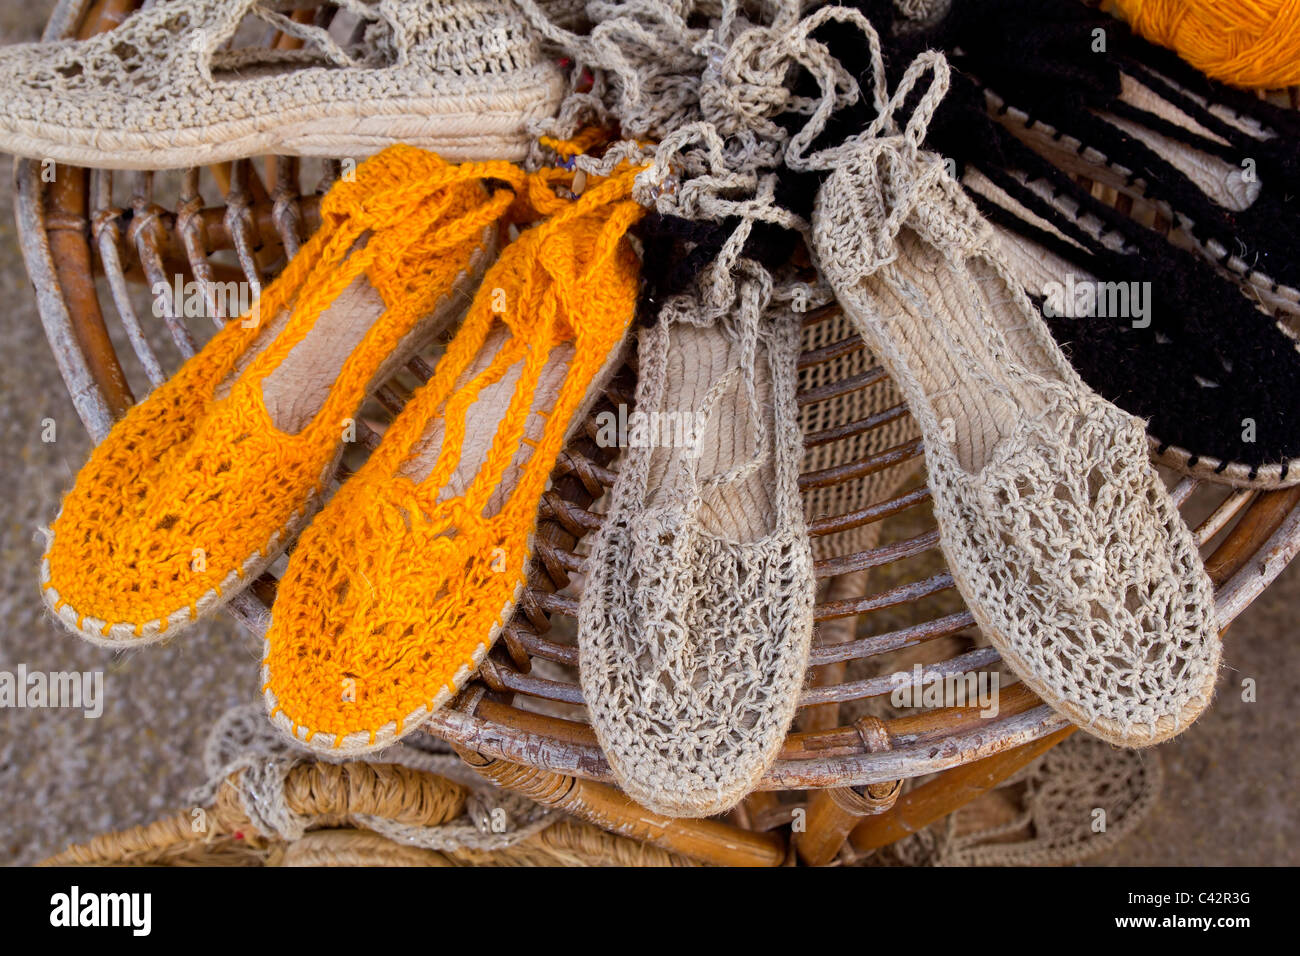 Ibiza mediterranean traditional handcraft handwoven shoes - Stock Image